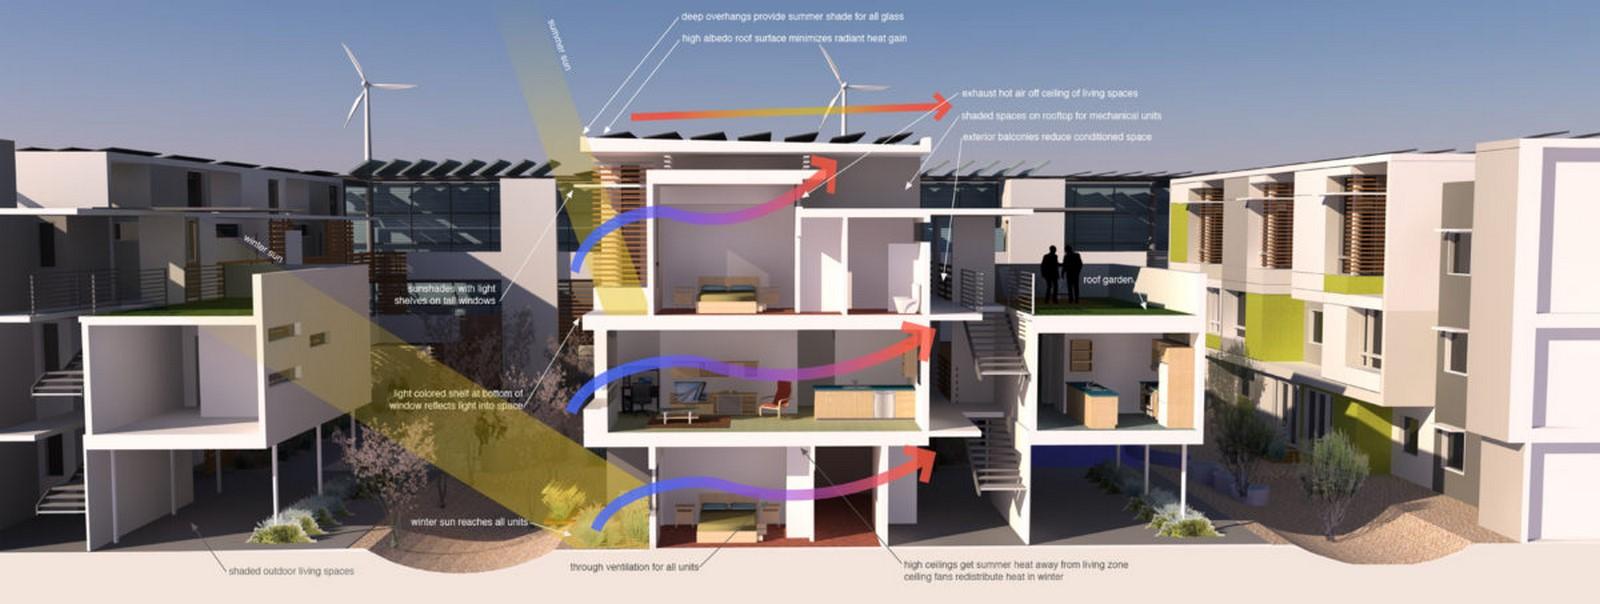 Paisano Green Community Senior Housing by Workshop8: First NetZero, Fossil Fuel Free, LEED Platinum senior housing - Sheet6